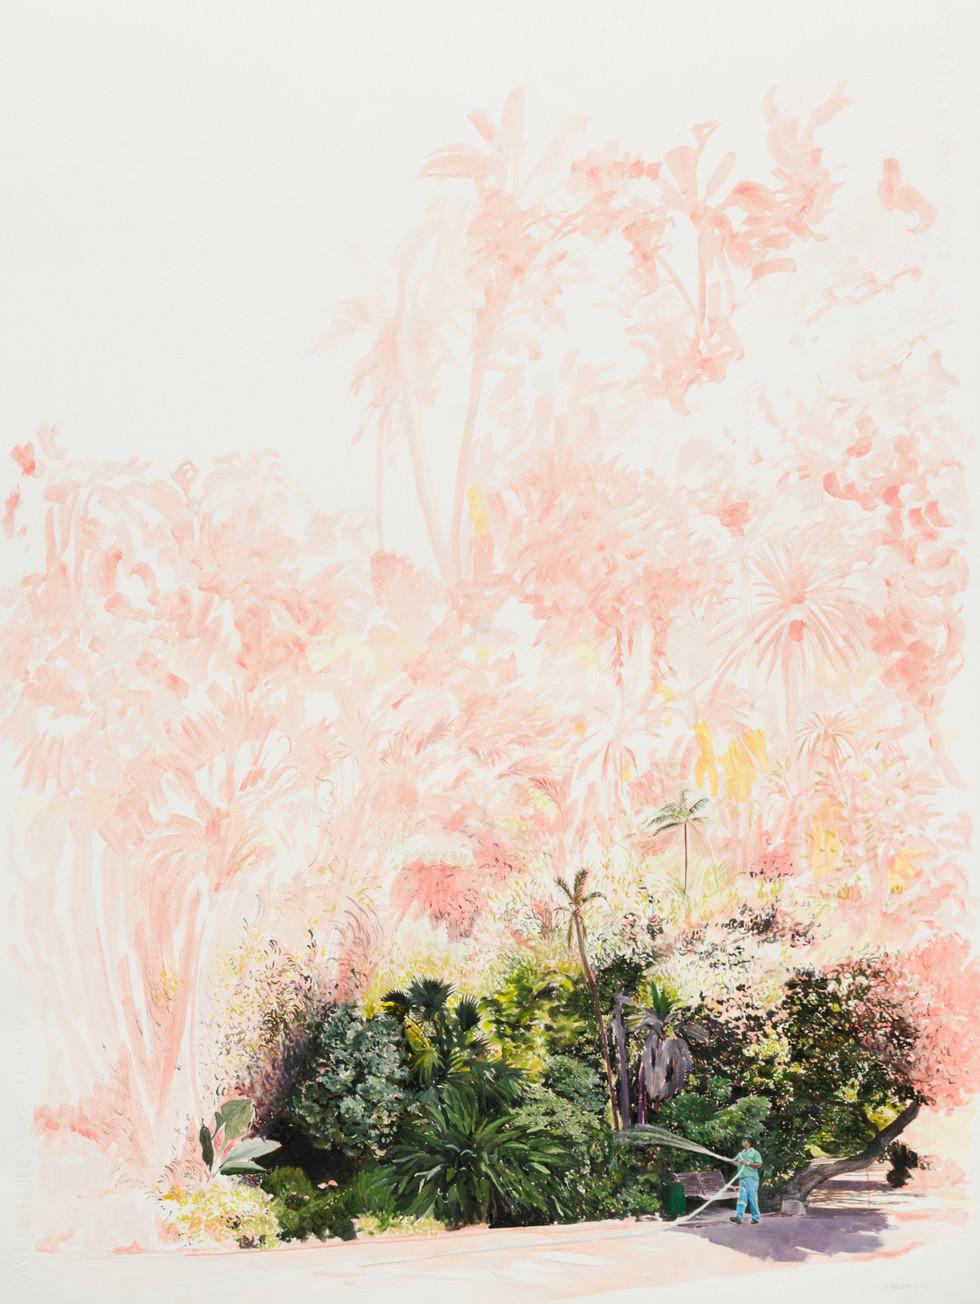 KIRSTEN BEETS. Grow, 2017. Oil on paper. 810 x 615mm. Framed.JPG